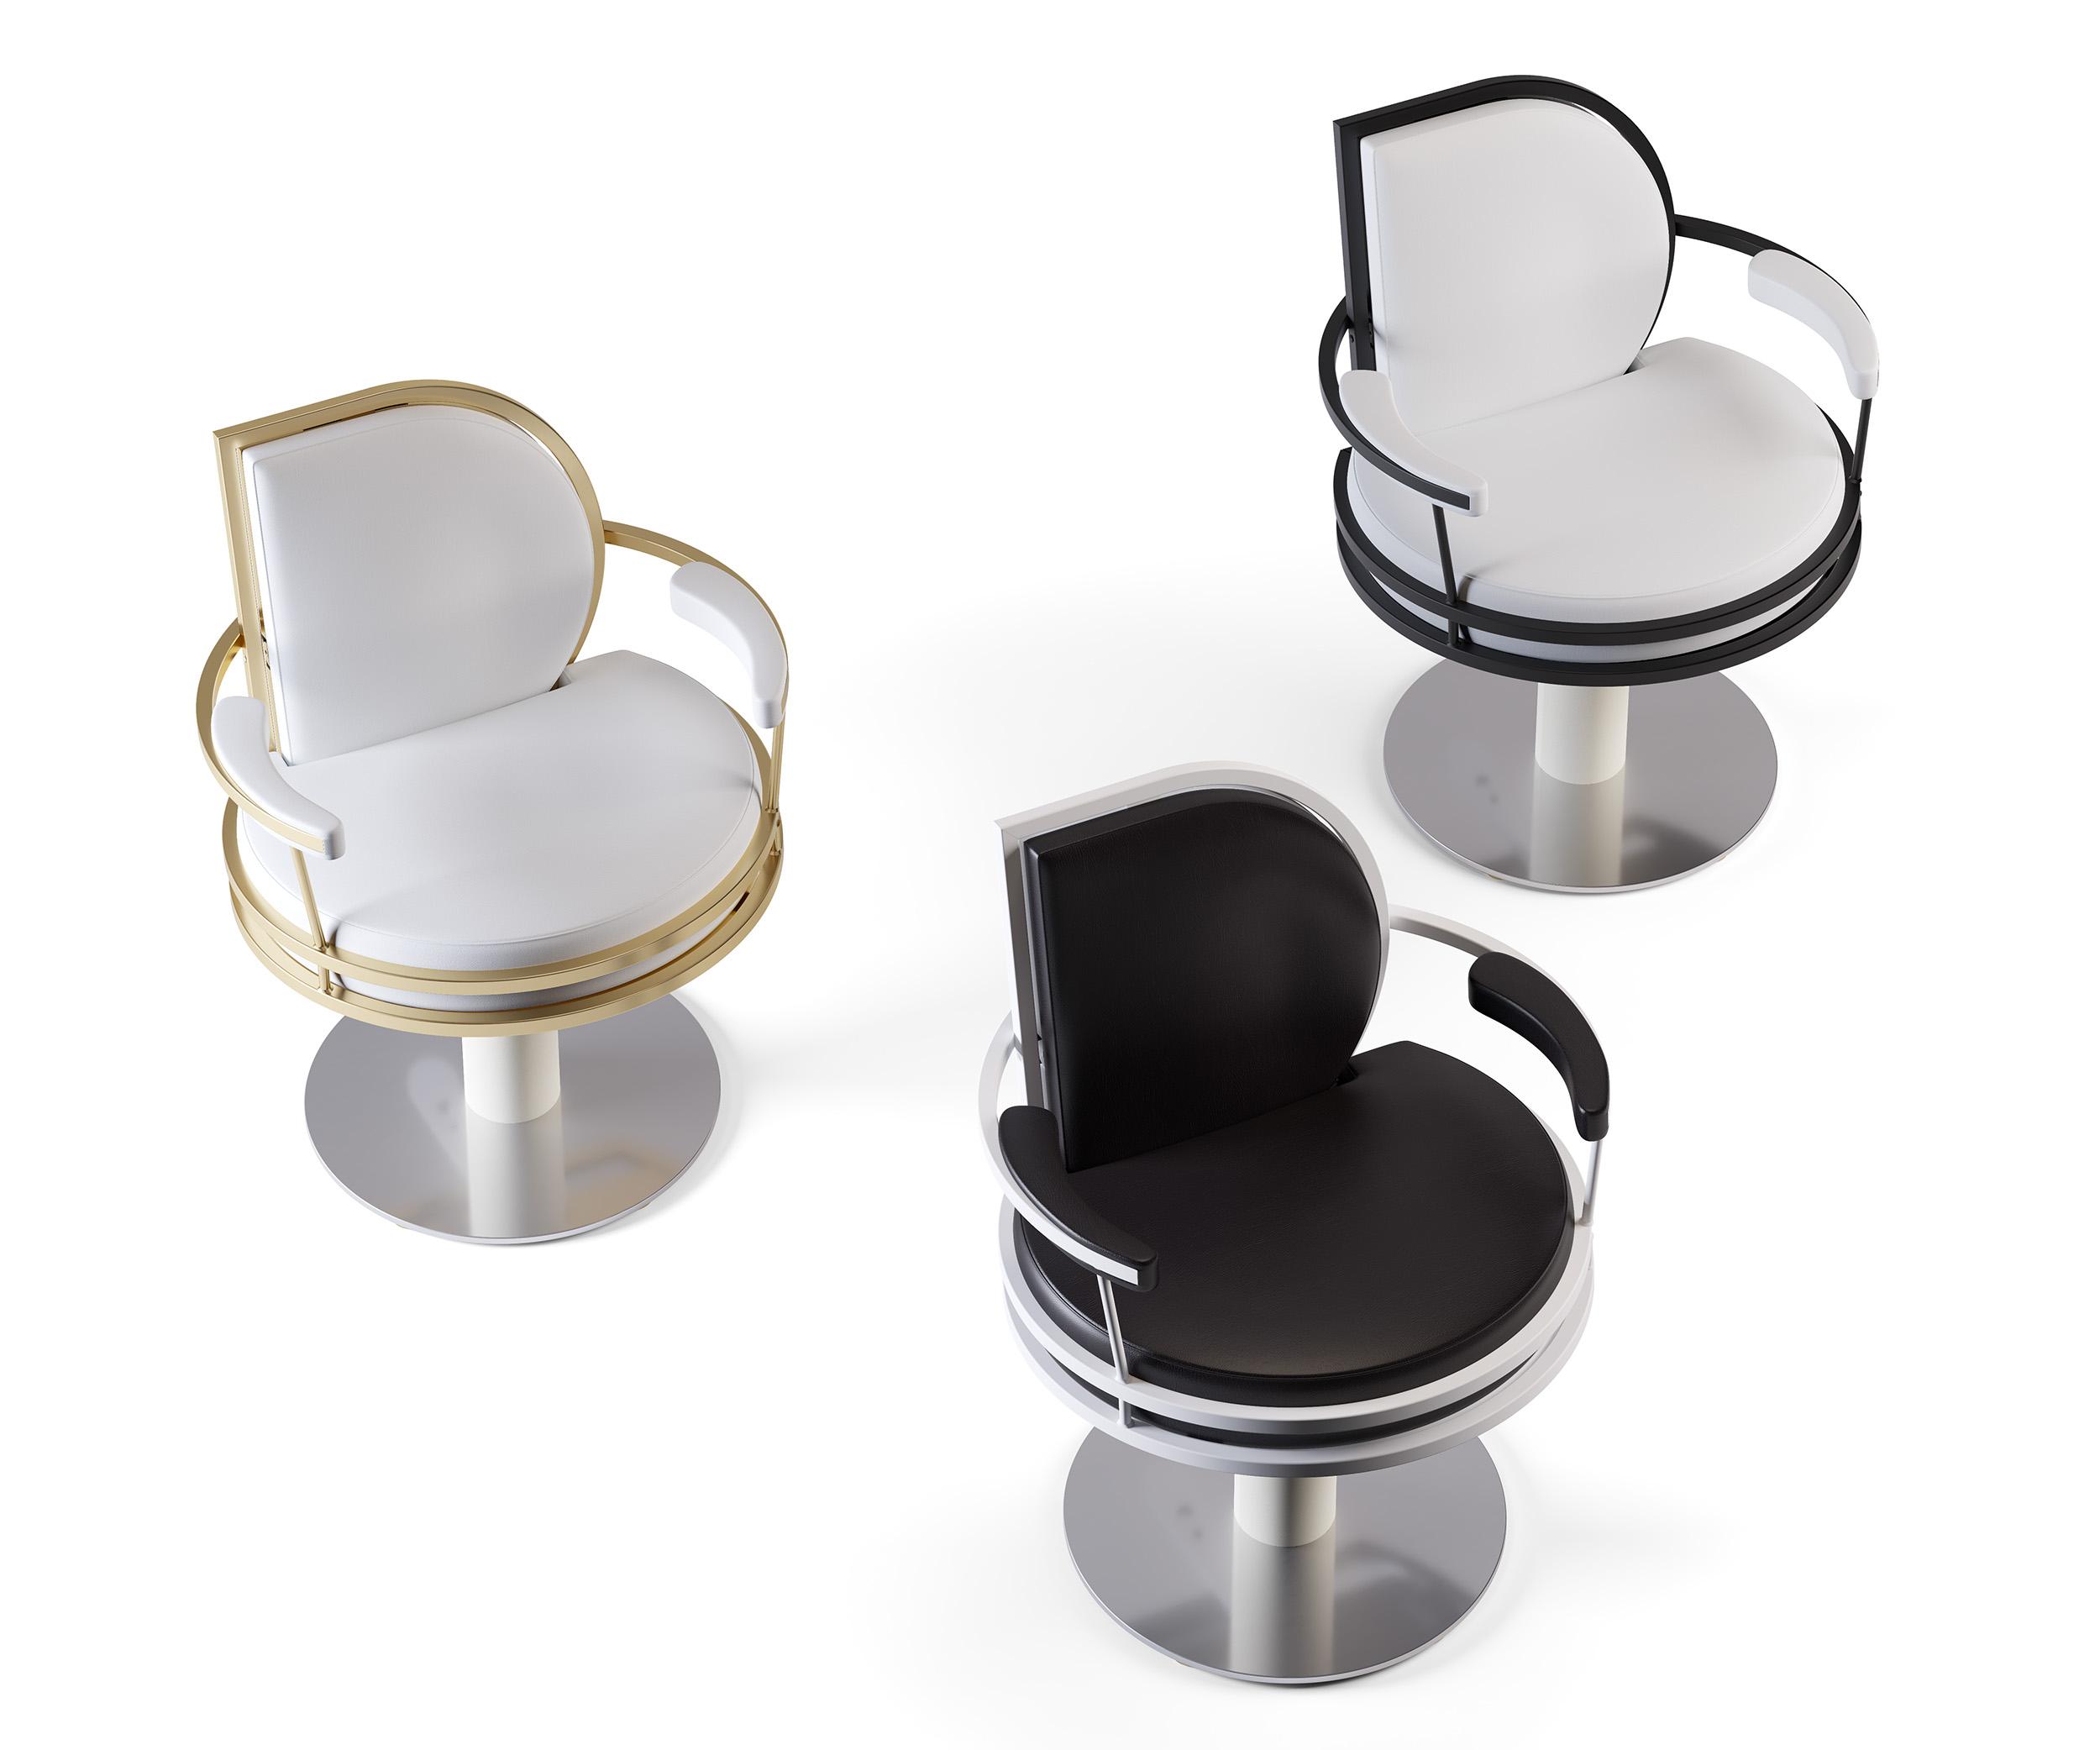 watson chair combo4_B copy.jpg